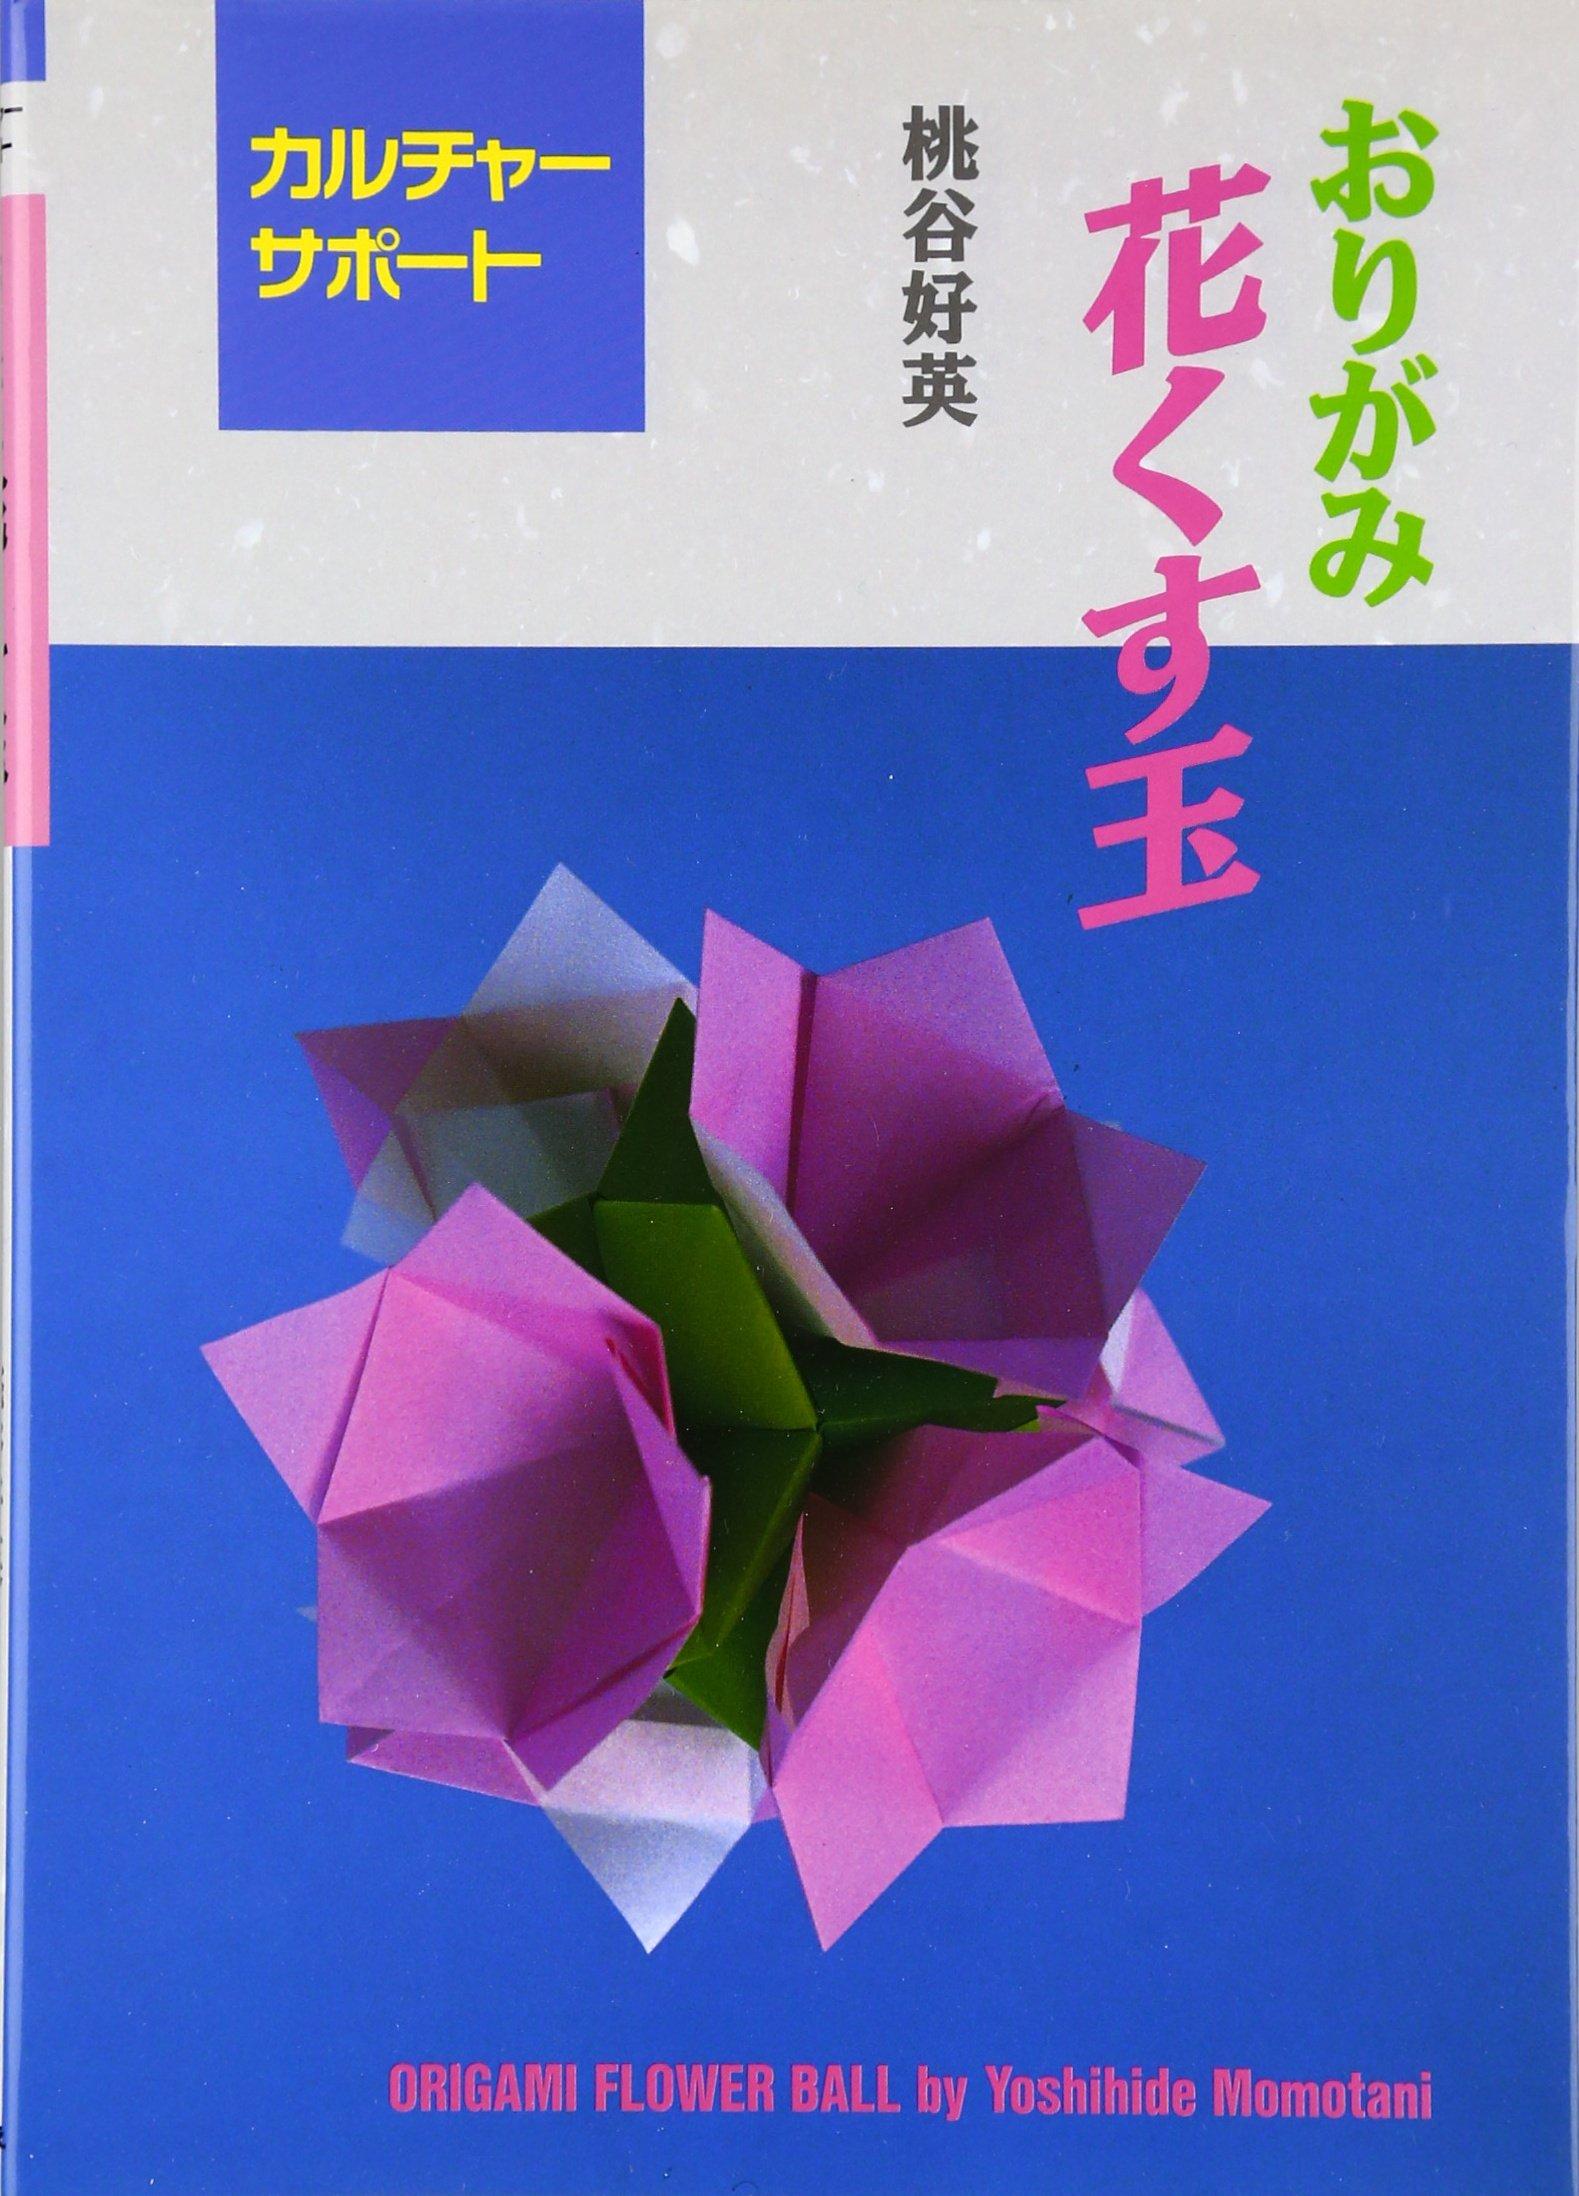 Origami Flower Ball Origami Hana Kusudama In Japanese Amazon